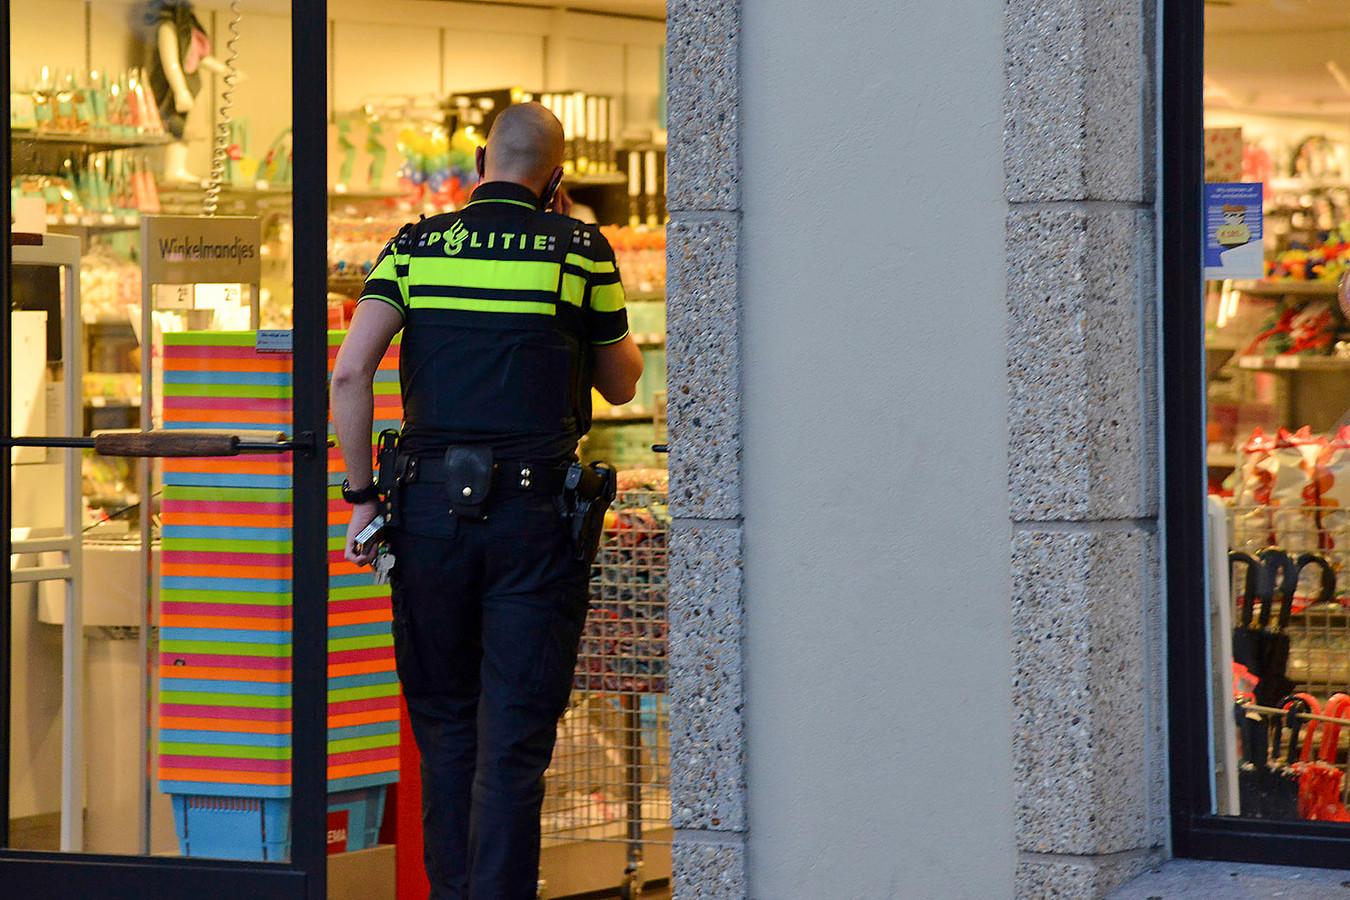 Gewapende overval op HEMA in Princenhage; politie zoekt dader. Foto Perry Roovers / MaRicMedia